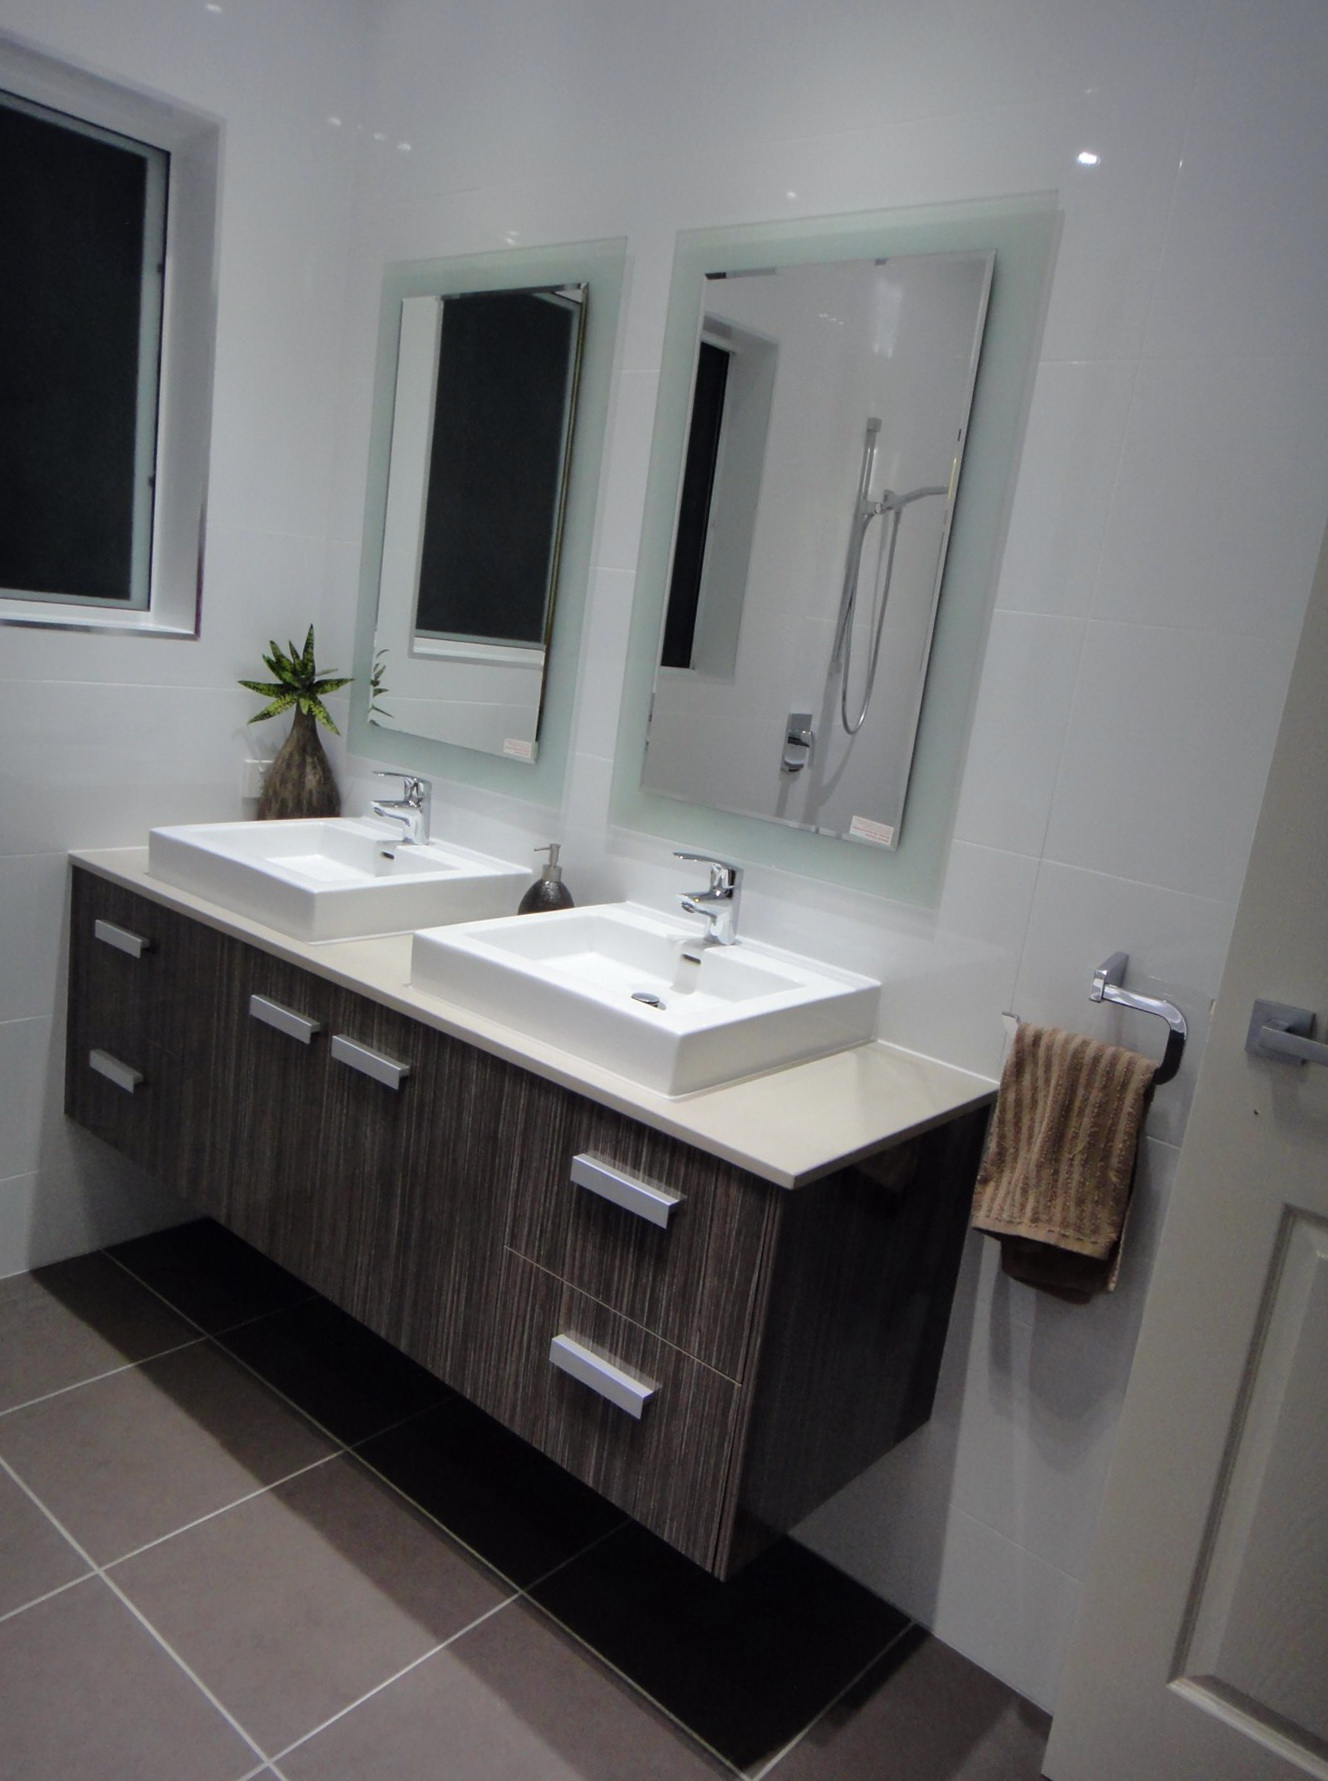 Bathroom Vanity Height For Wheelchair Access